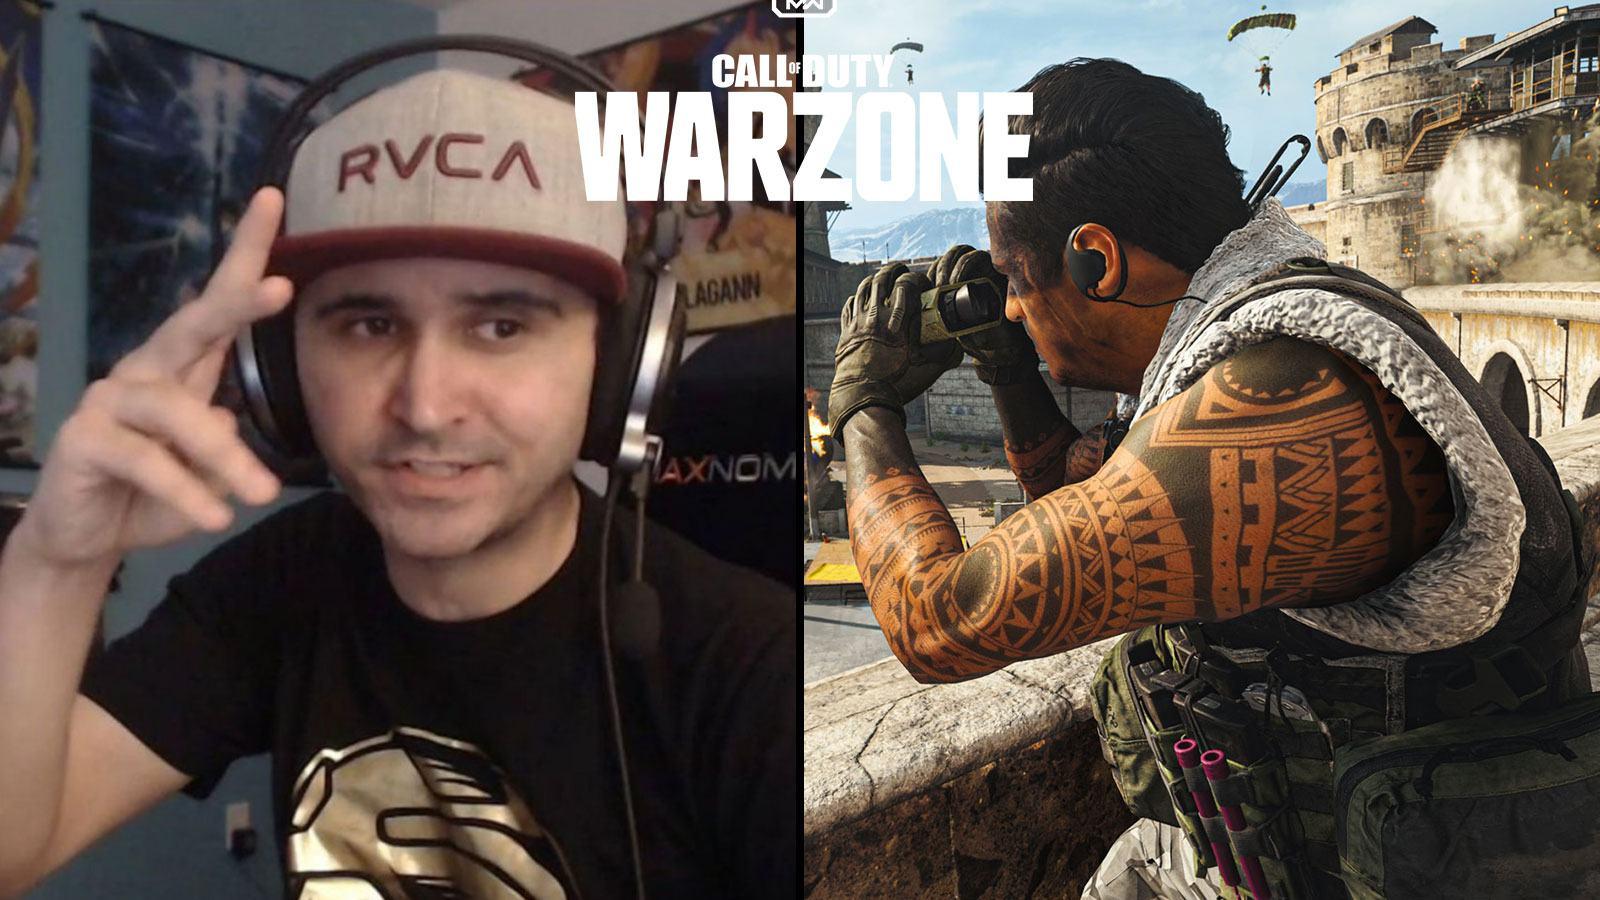 Summit1g Call of Duty Warzone Infinity Ward